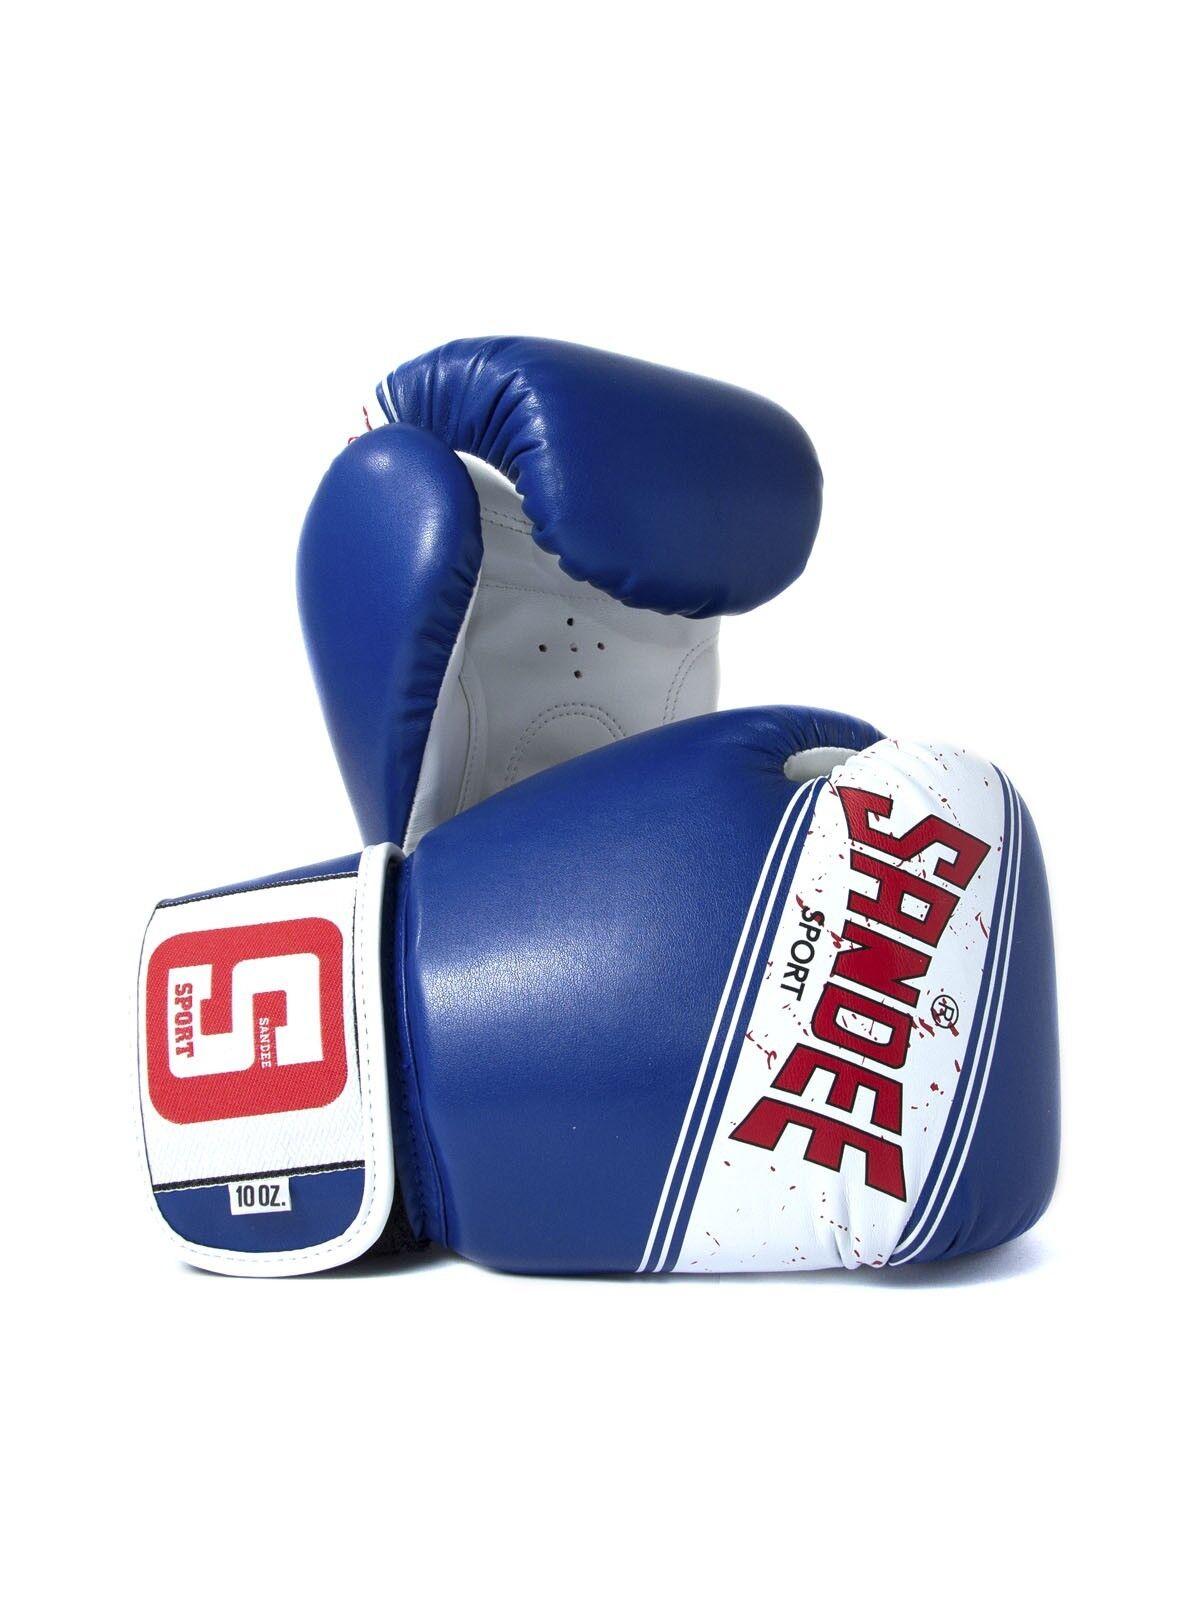 Sandee Sport Velcro Blau & Weiß Muay Thai Boxing Gloves